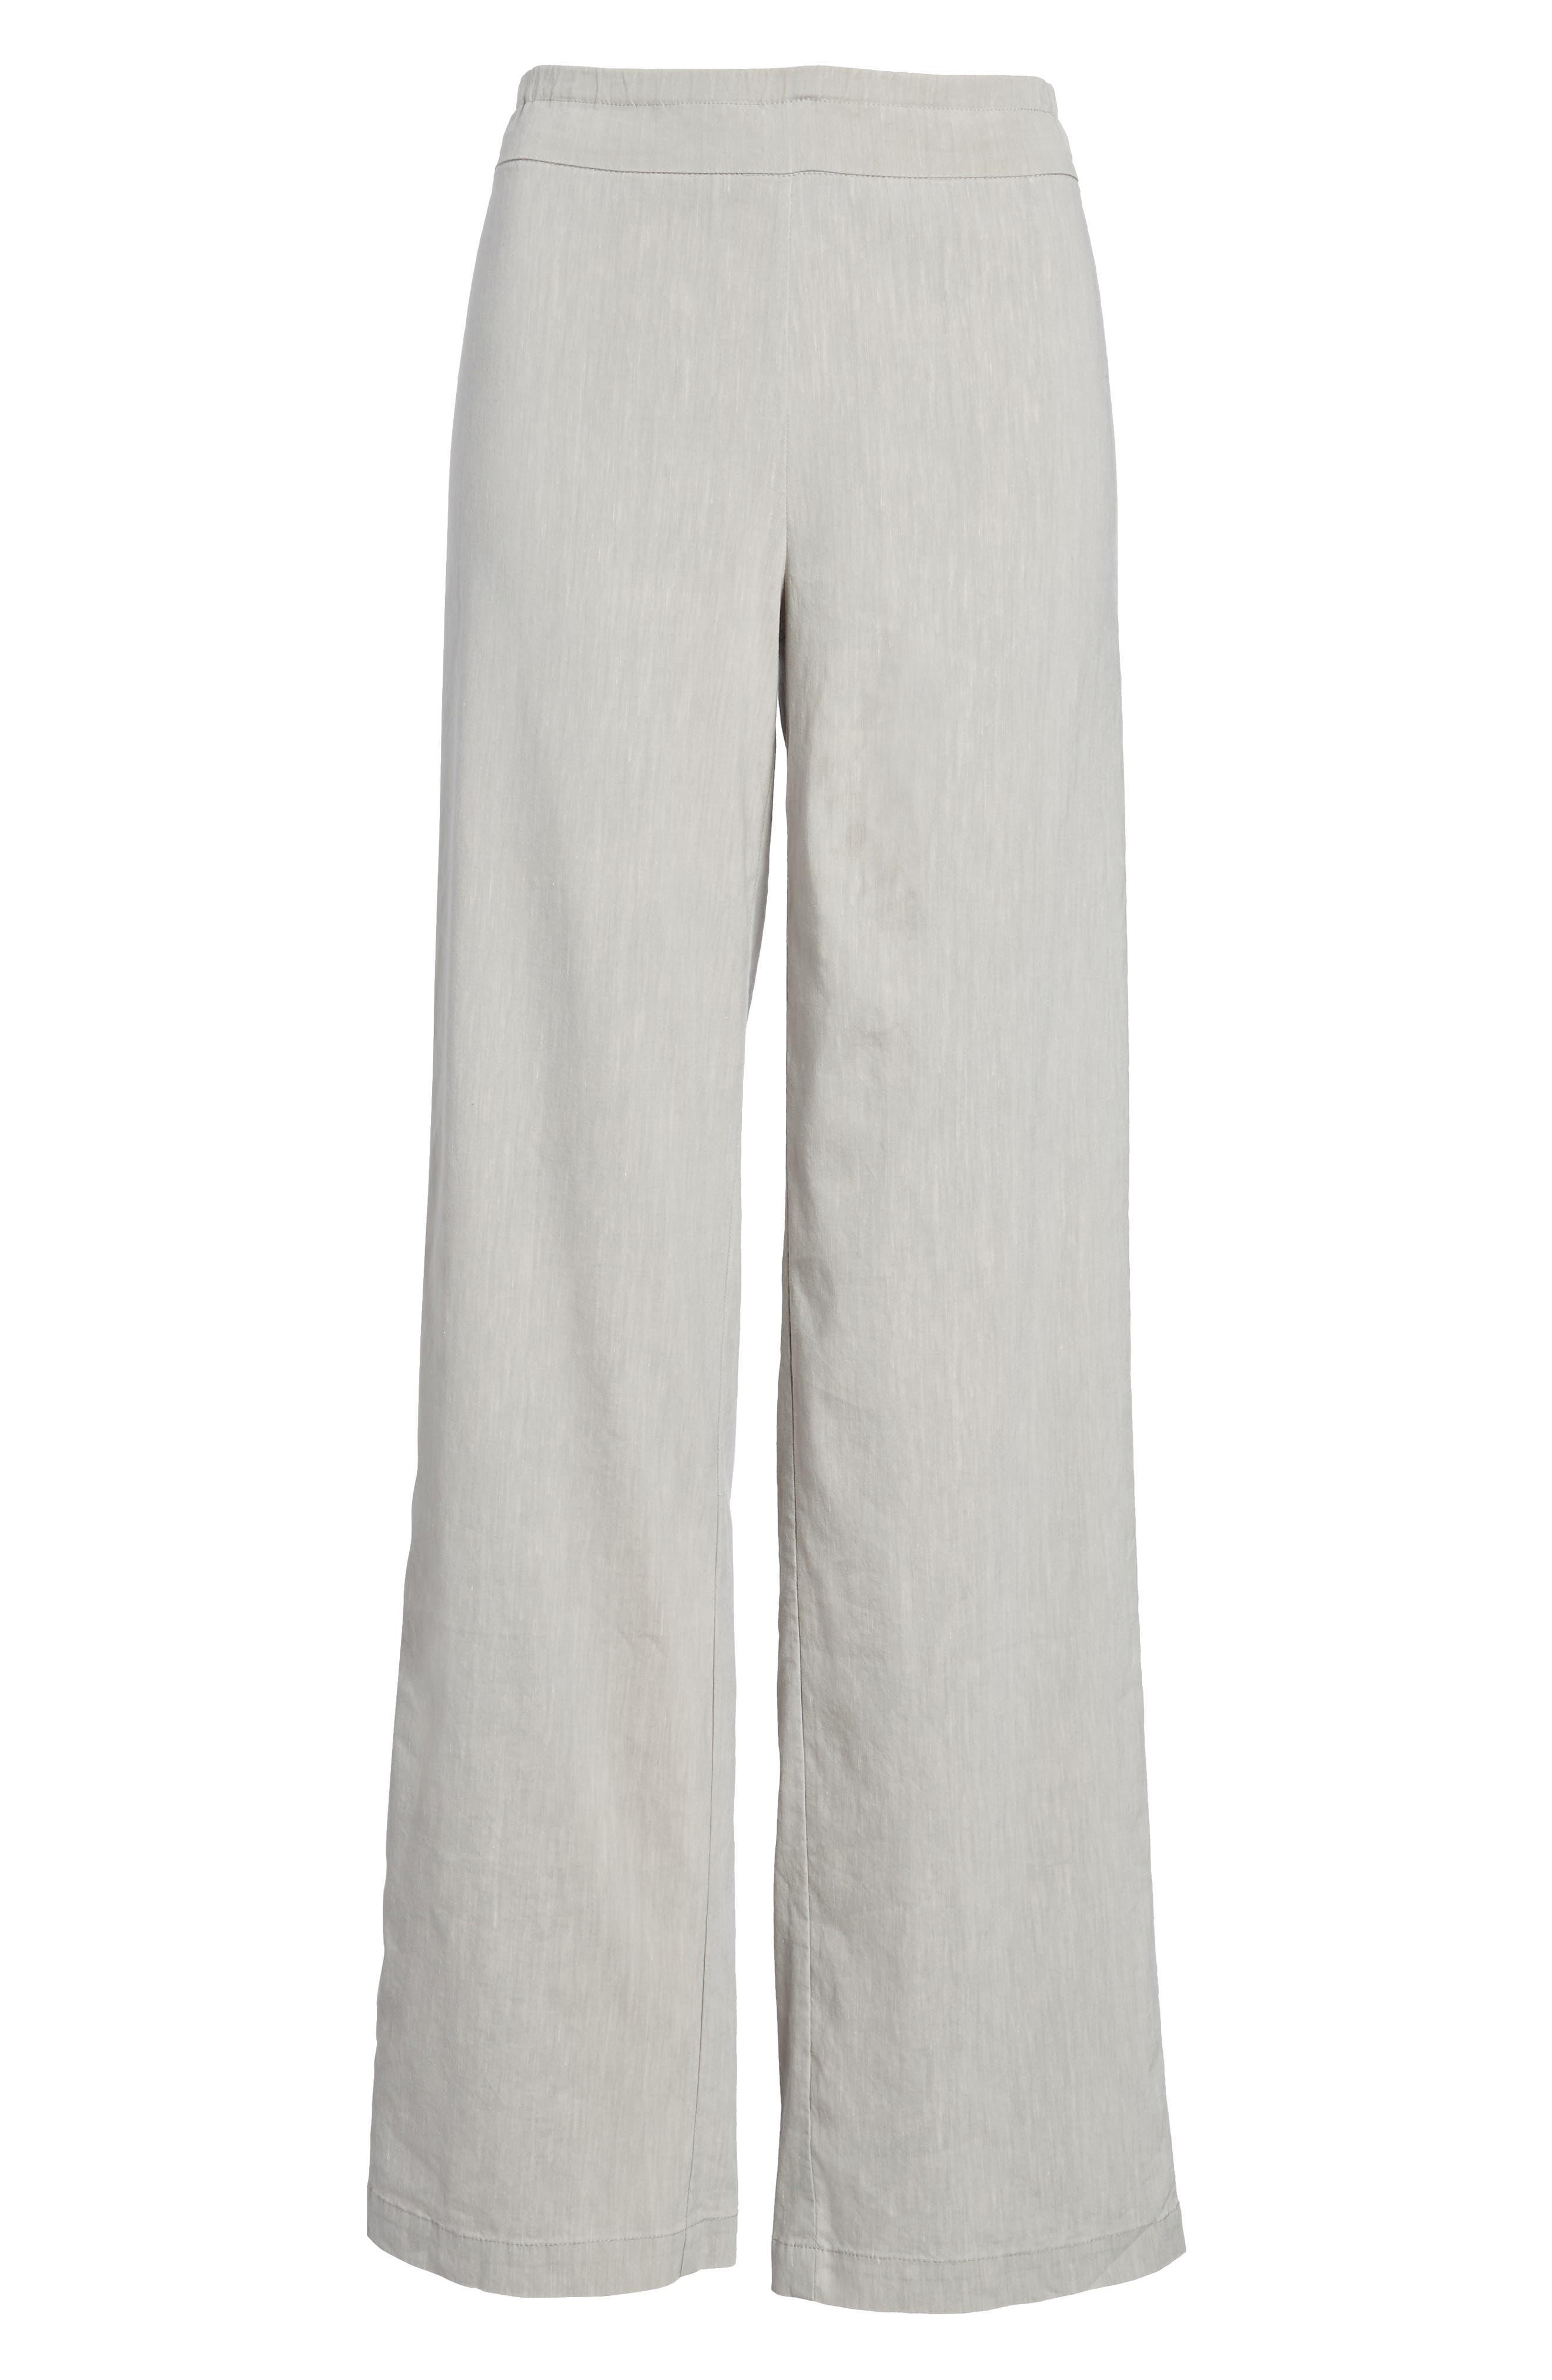 Traveling Linen Blend Stretch Pants,                             Alternate thumbnail 7, color,                             050